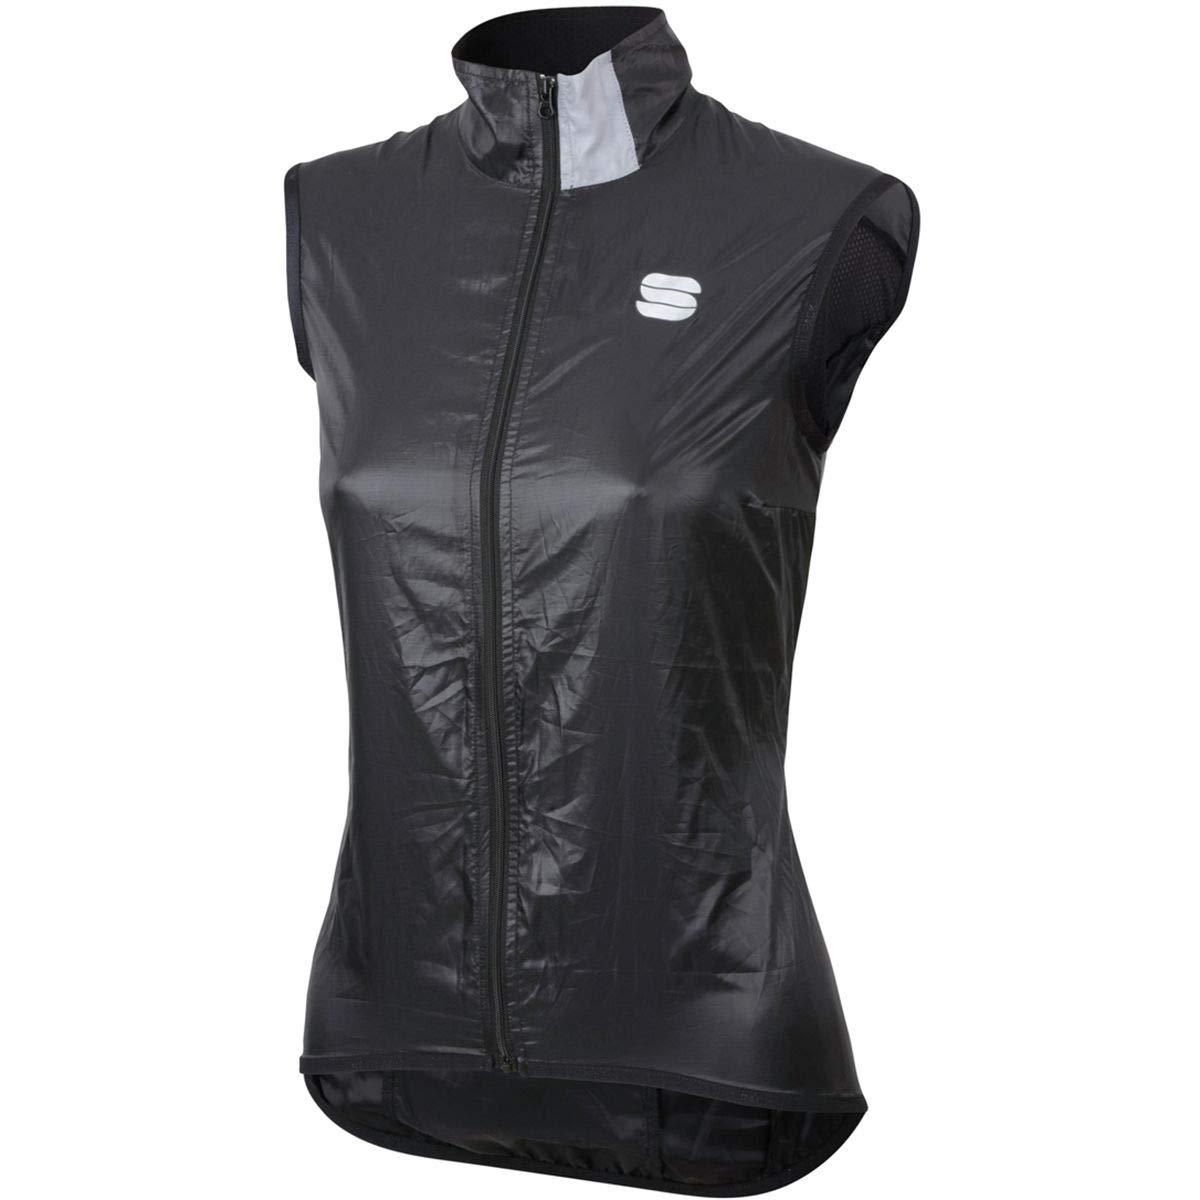 Sportful Hot Pack Easylight Vest Women - Black